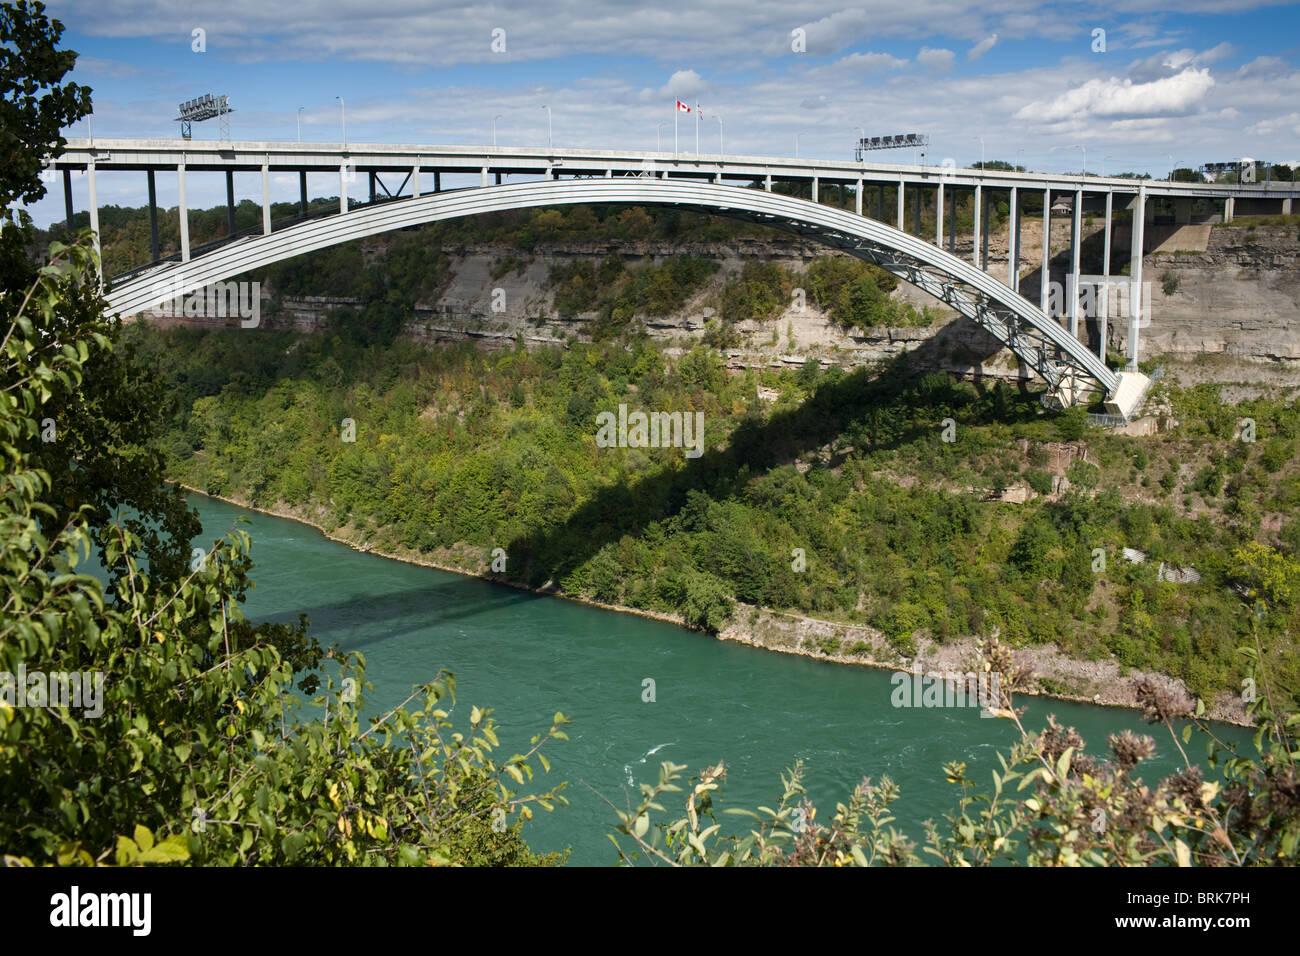 405 Bridge between Canada and New York State spans Niagara escarpment - Stock Image